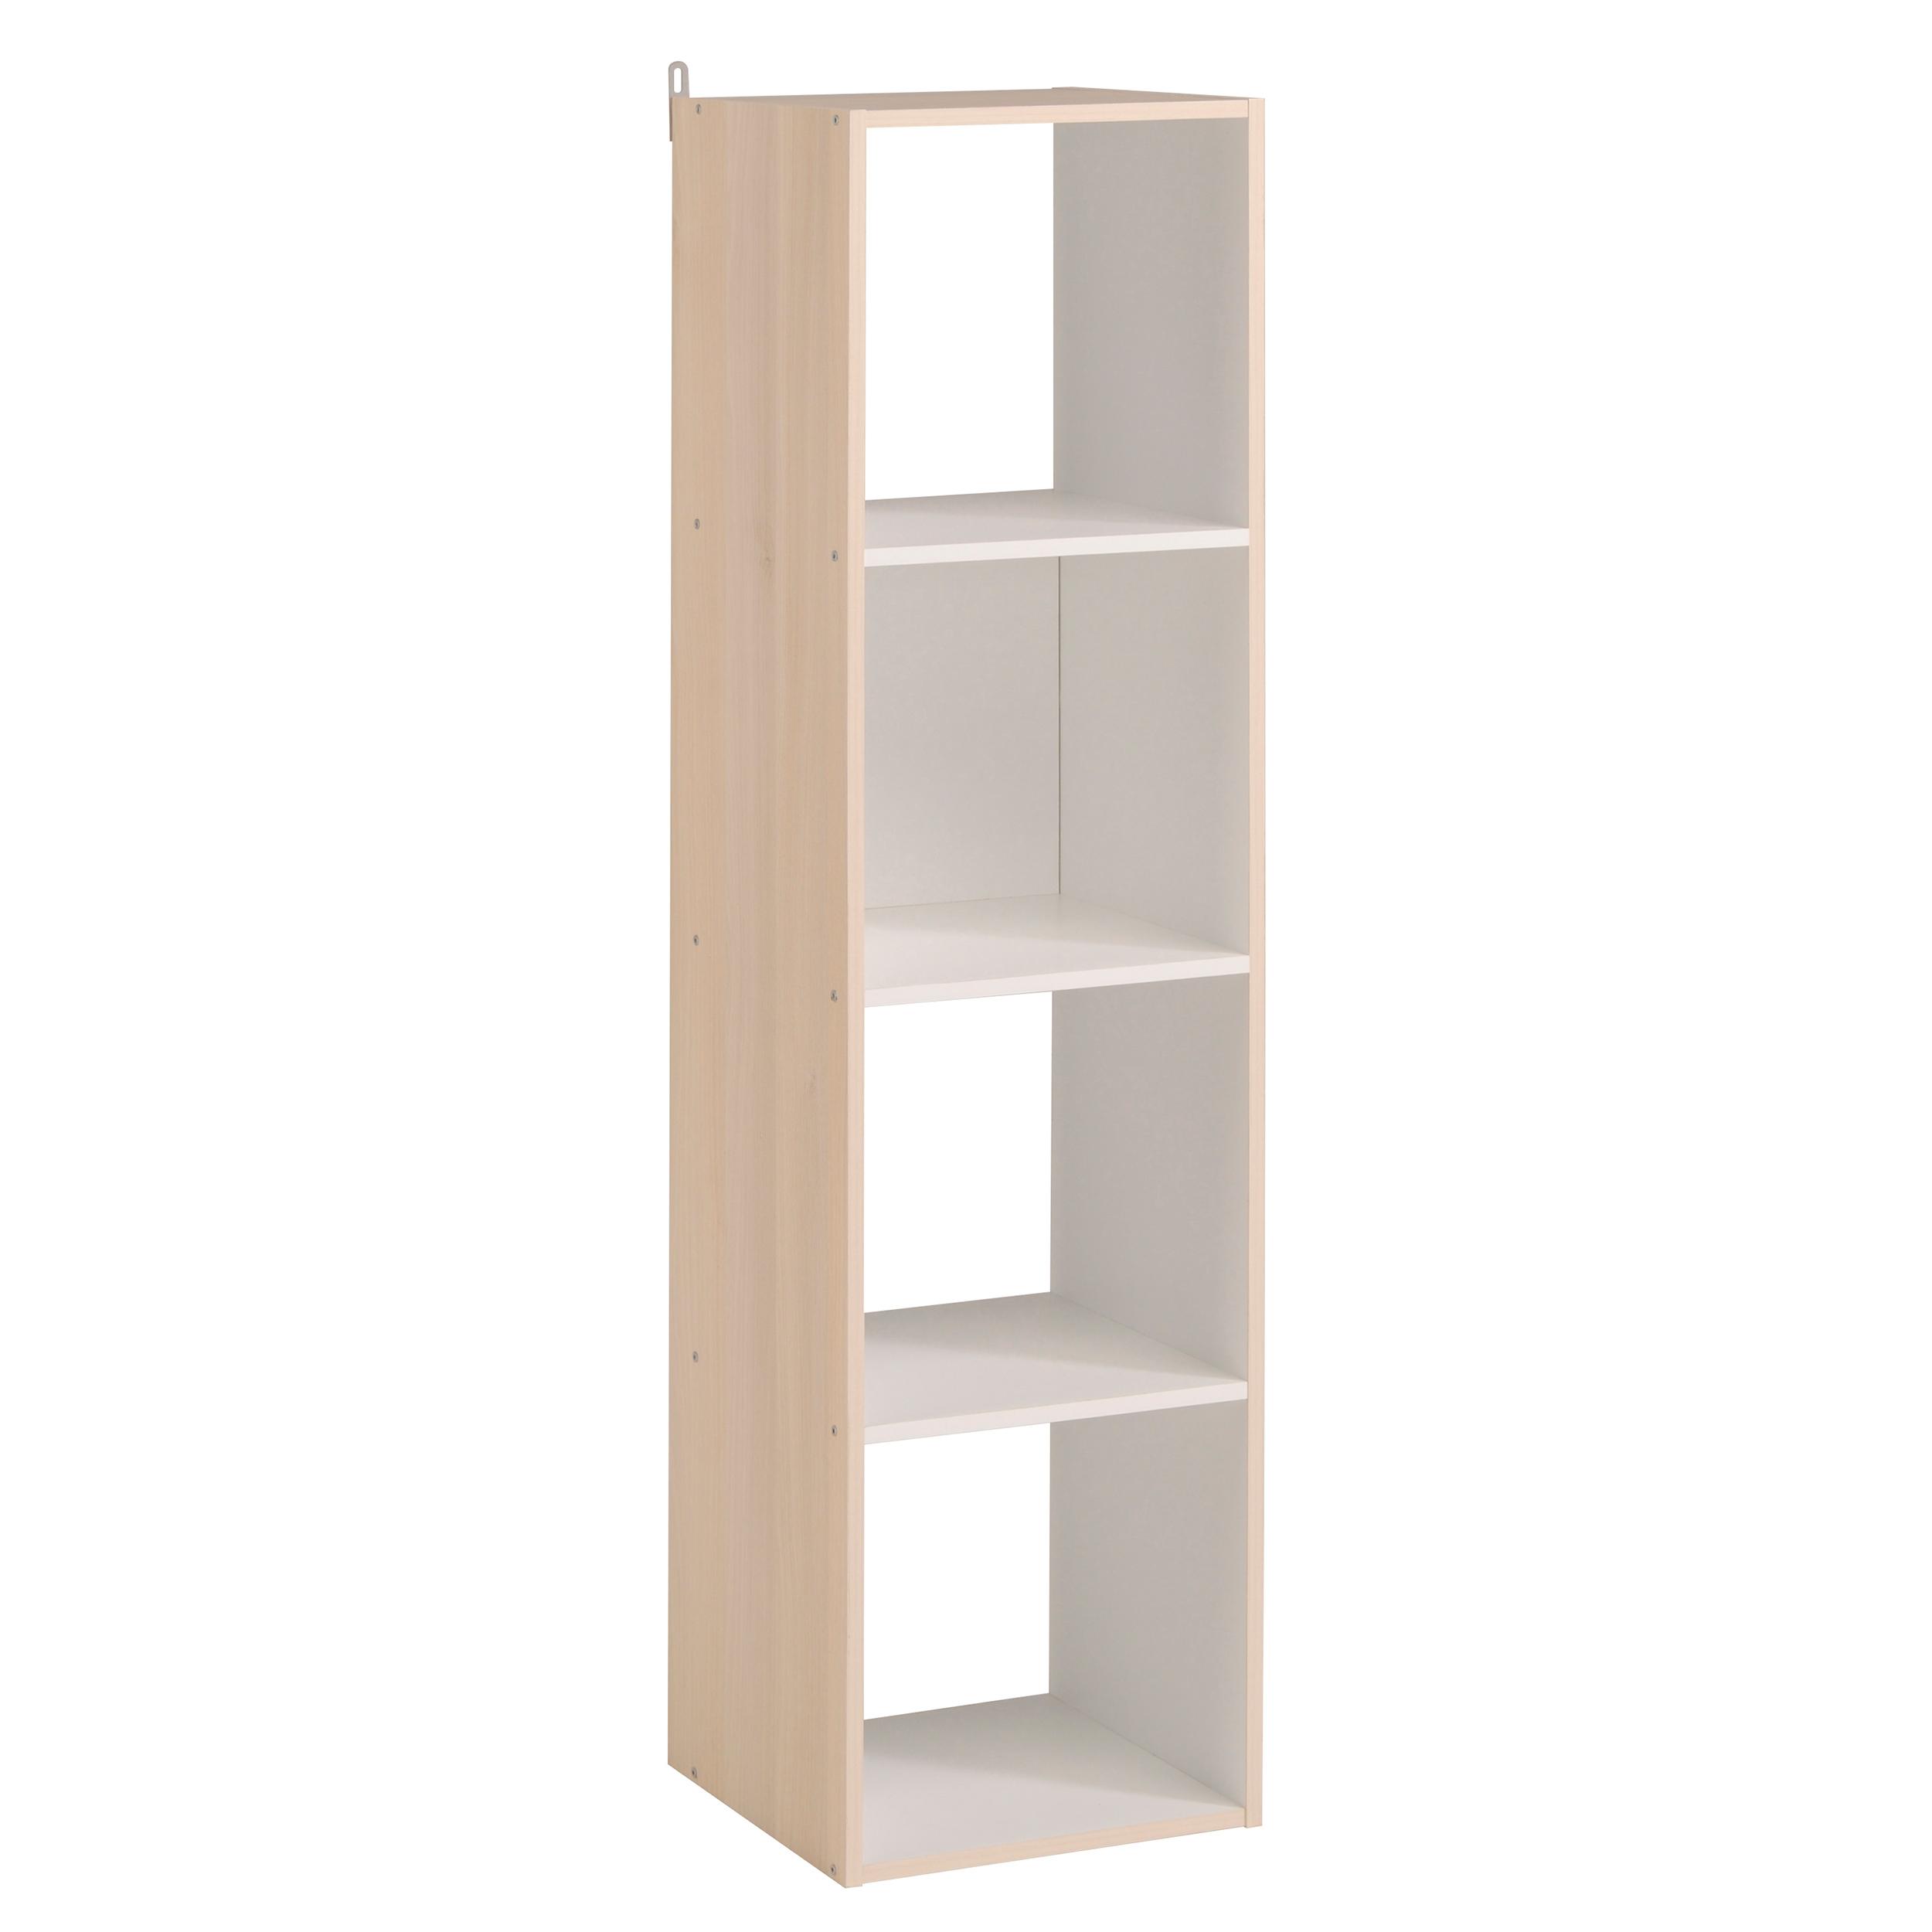 00001f7b6f861 Colonne de rangement 4 compartiments blanche/acacia Lilicube | Matelpro